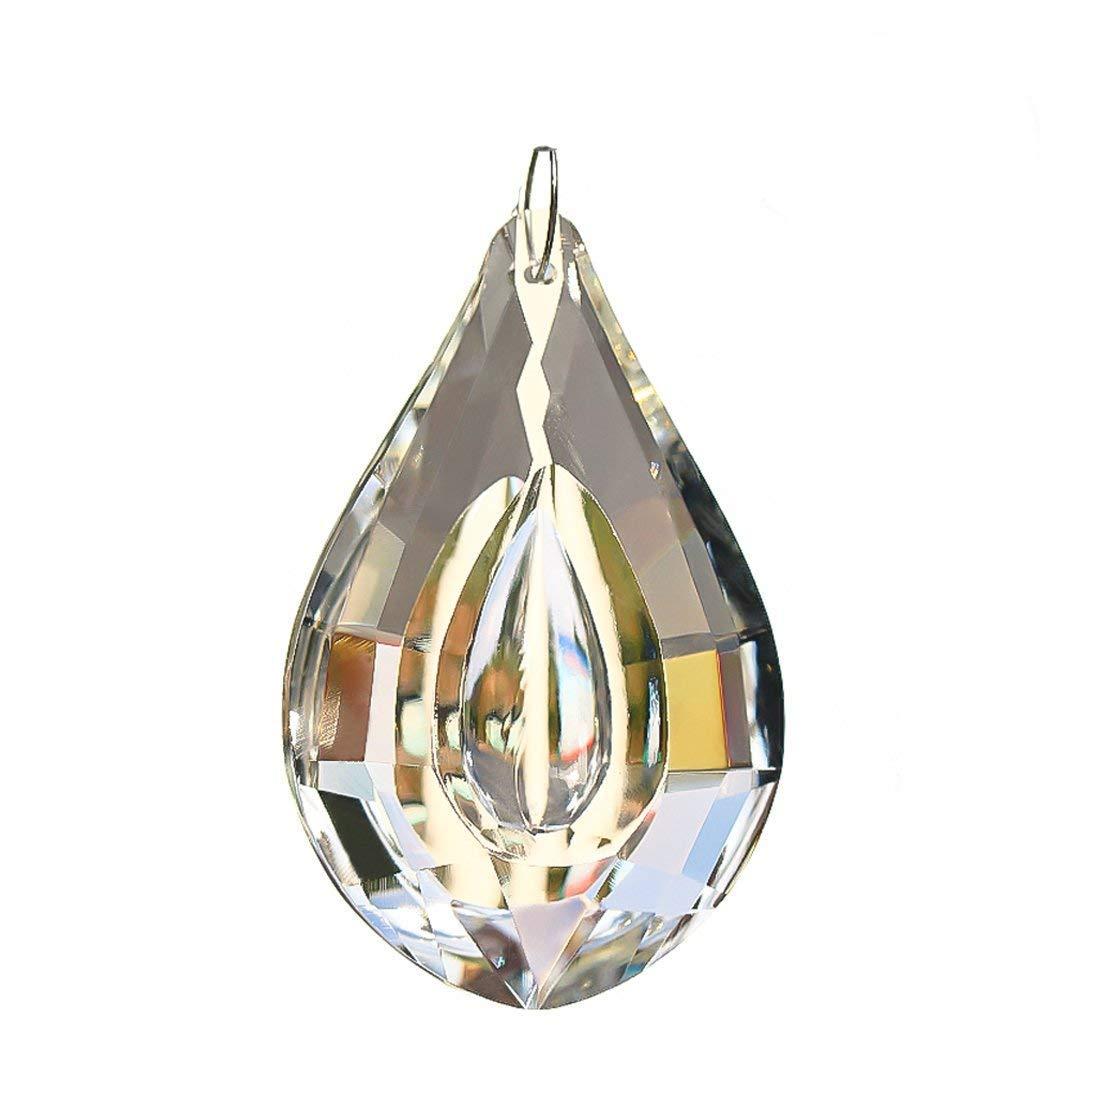 H&D 10Pcs 63mm Clear Large Loquat Style Crystal Beads Drop Pendants Chandelier Curtain Lamp Chain Prisms for Wedding Party Centerpieces Decoration